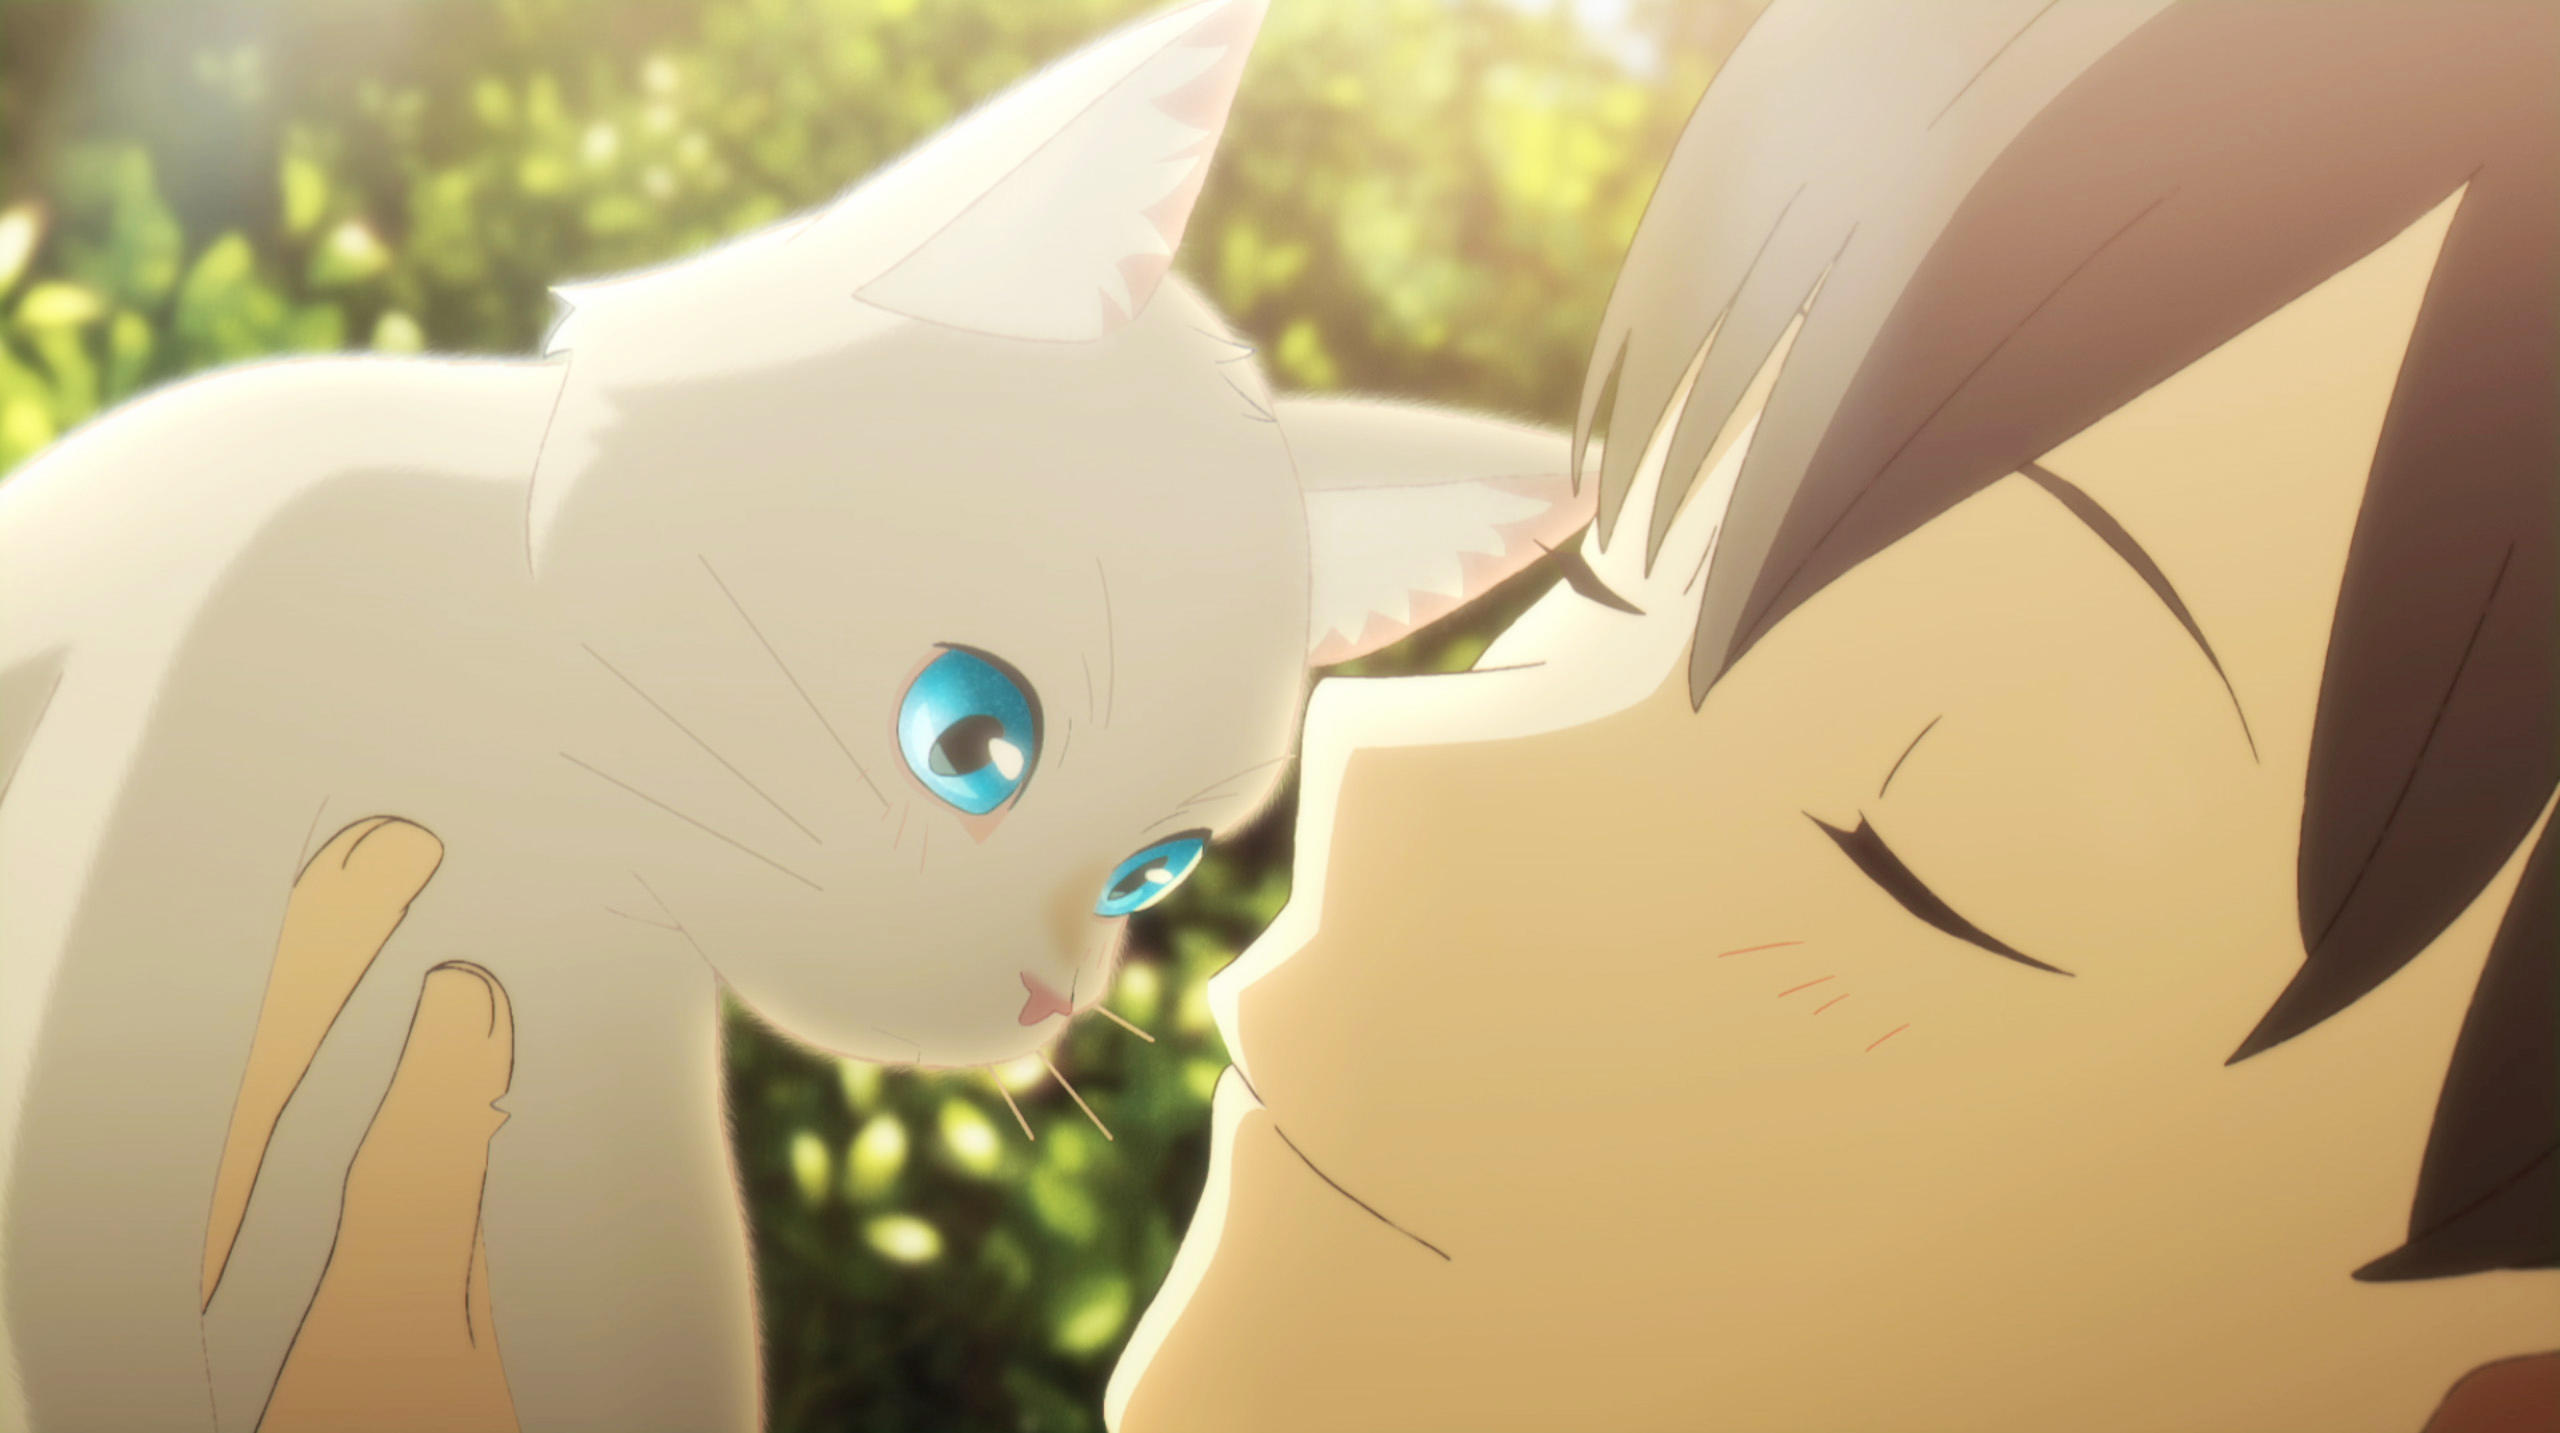 Netflixアニメ映画『泣きたい私は猫をかぶる』初解禁の本編シーンを含む特別映像公開!